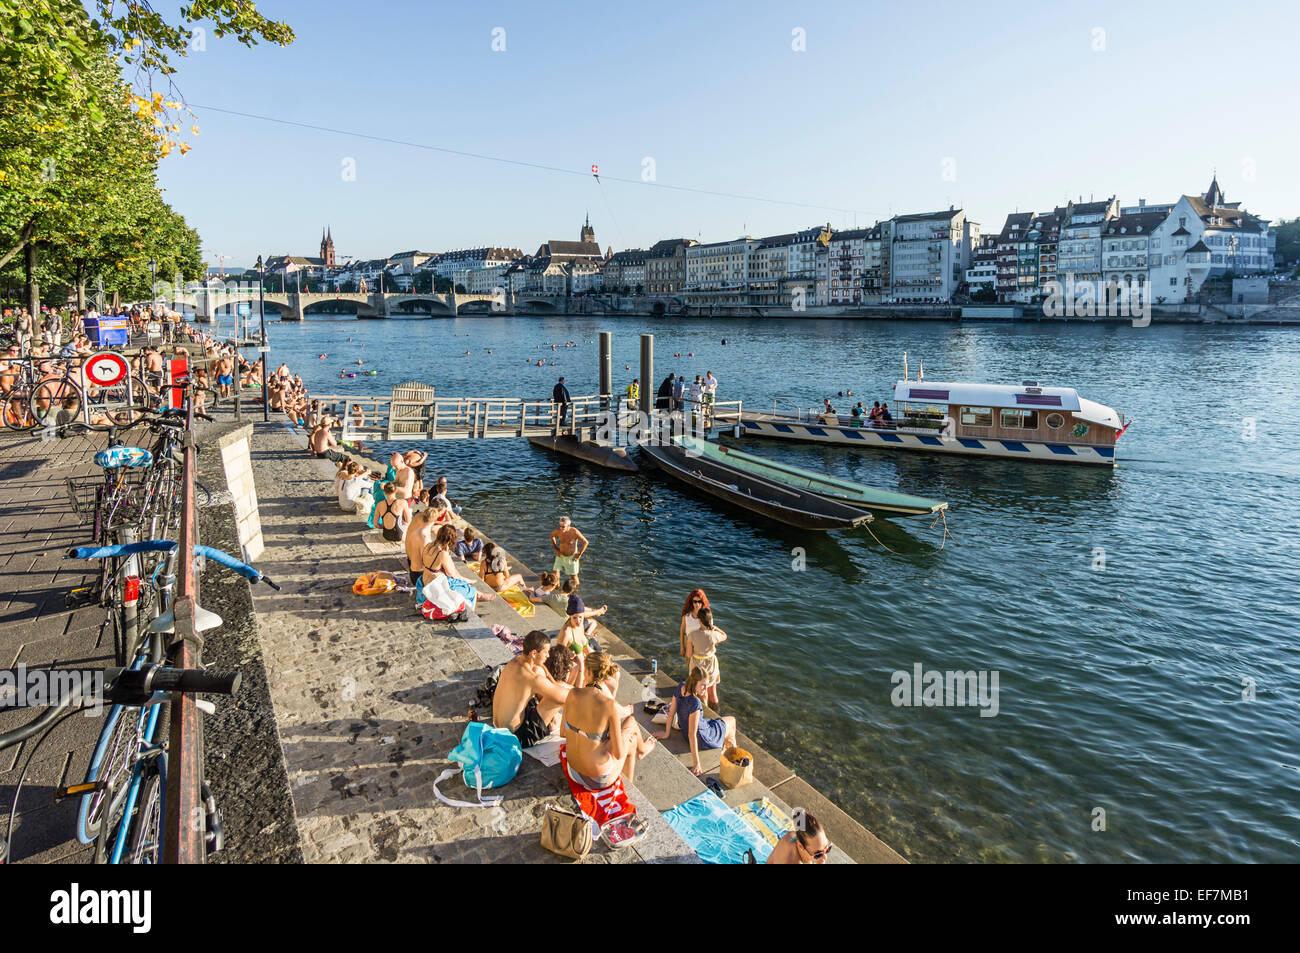 Rhine River in Summer, Middle Bridge, Ferry, Basel, Switzerland - Stock Image